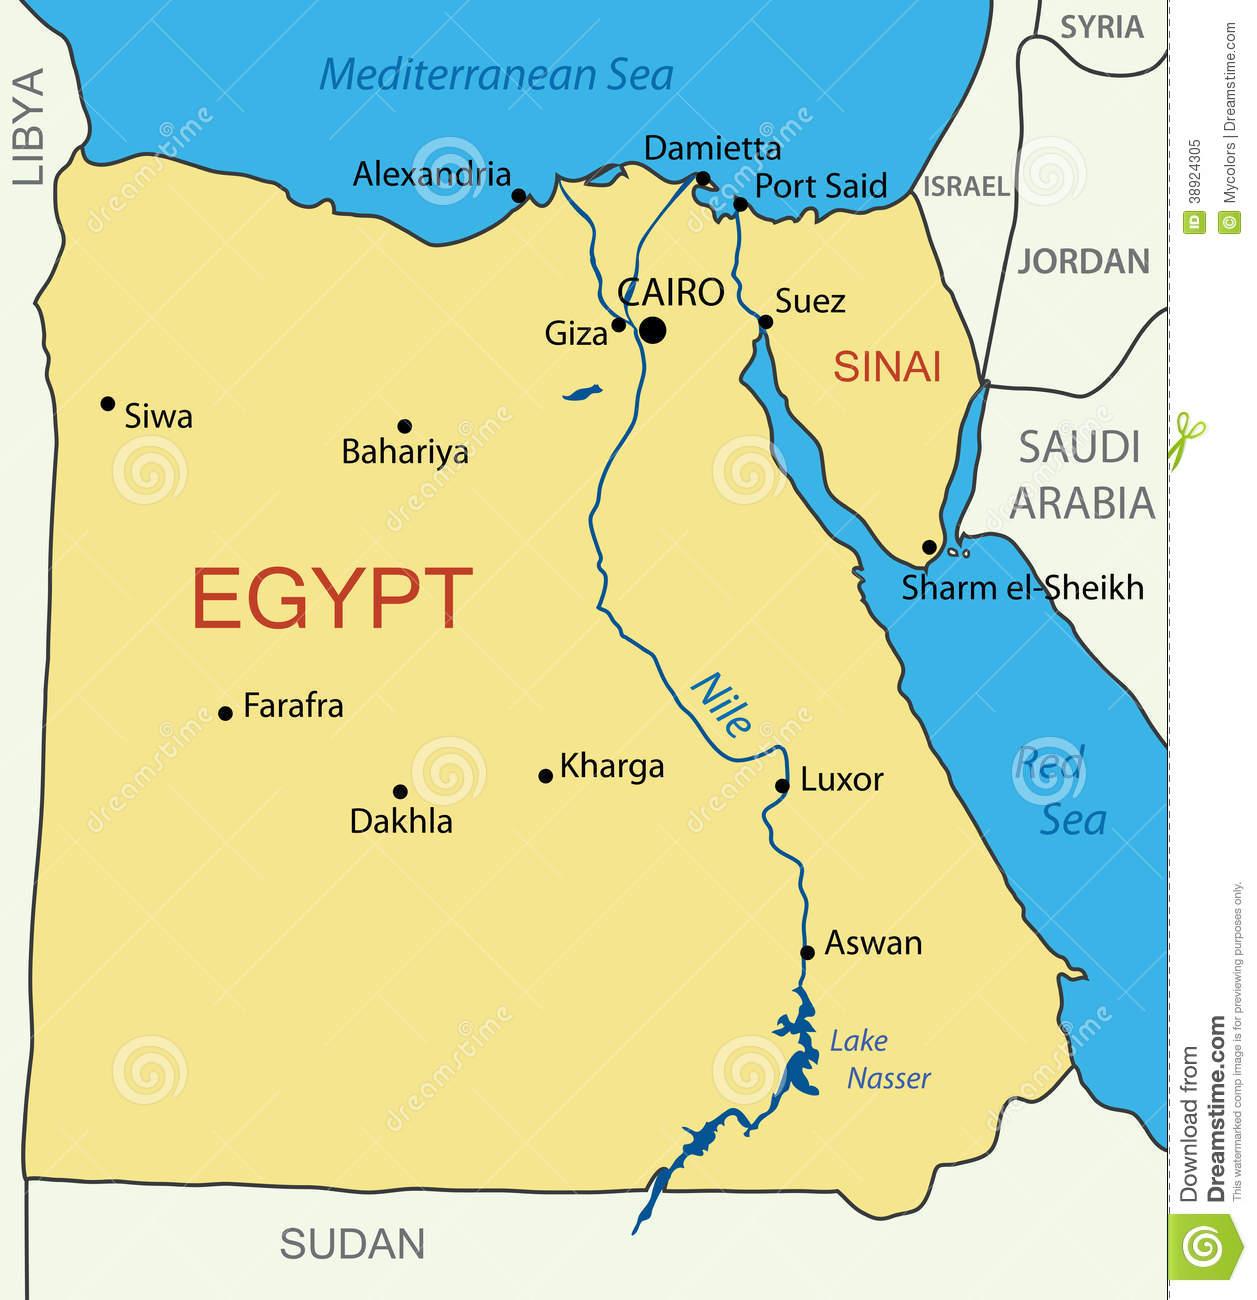 Mapa De Egipto Mapa Físico Geográfico Político Turístico Y Temático